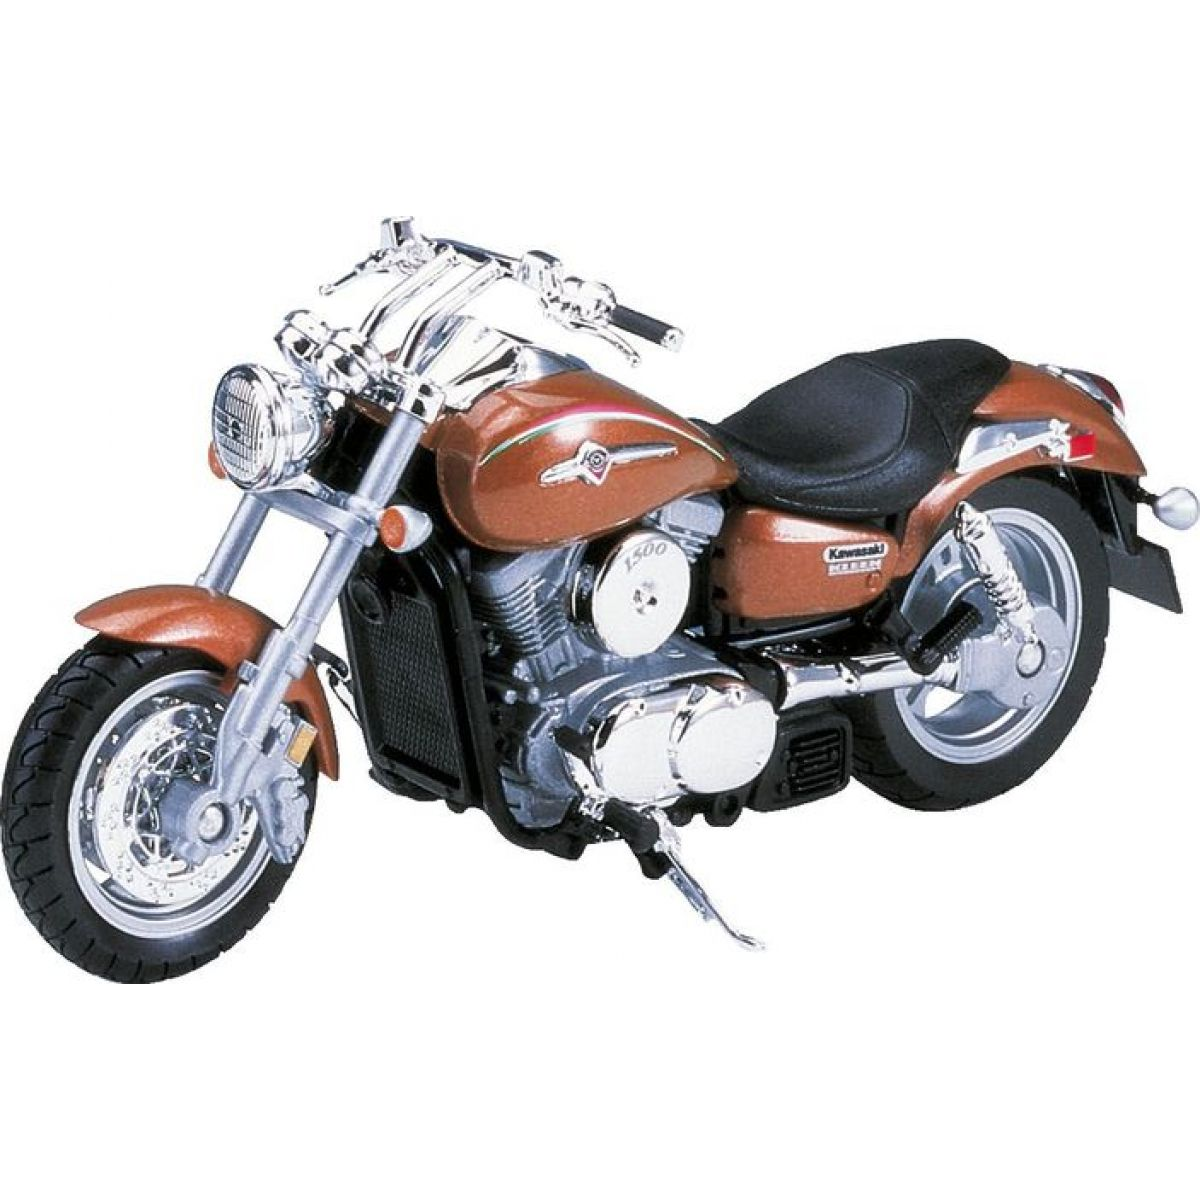 Dromader Welly Motorka 11cm - Kawasaki Vulcan 1500 Mean Streak